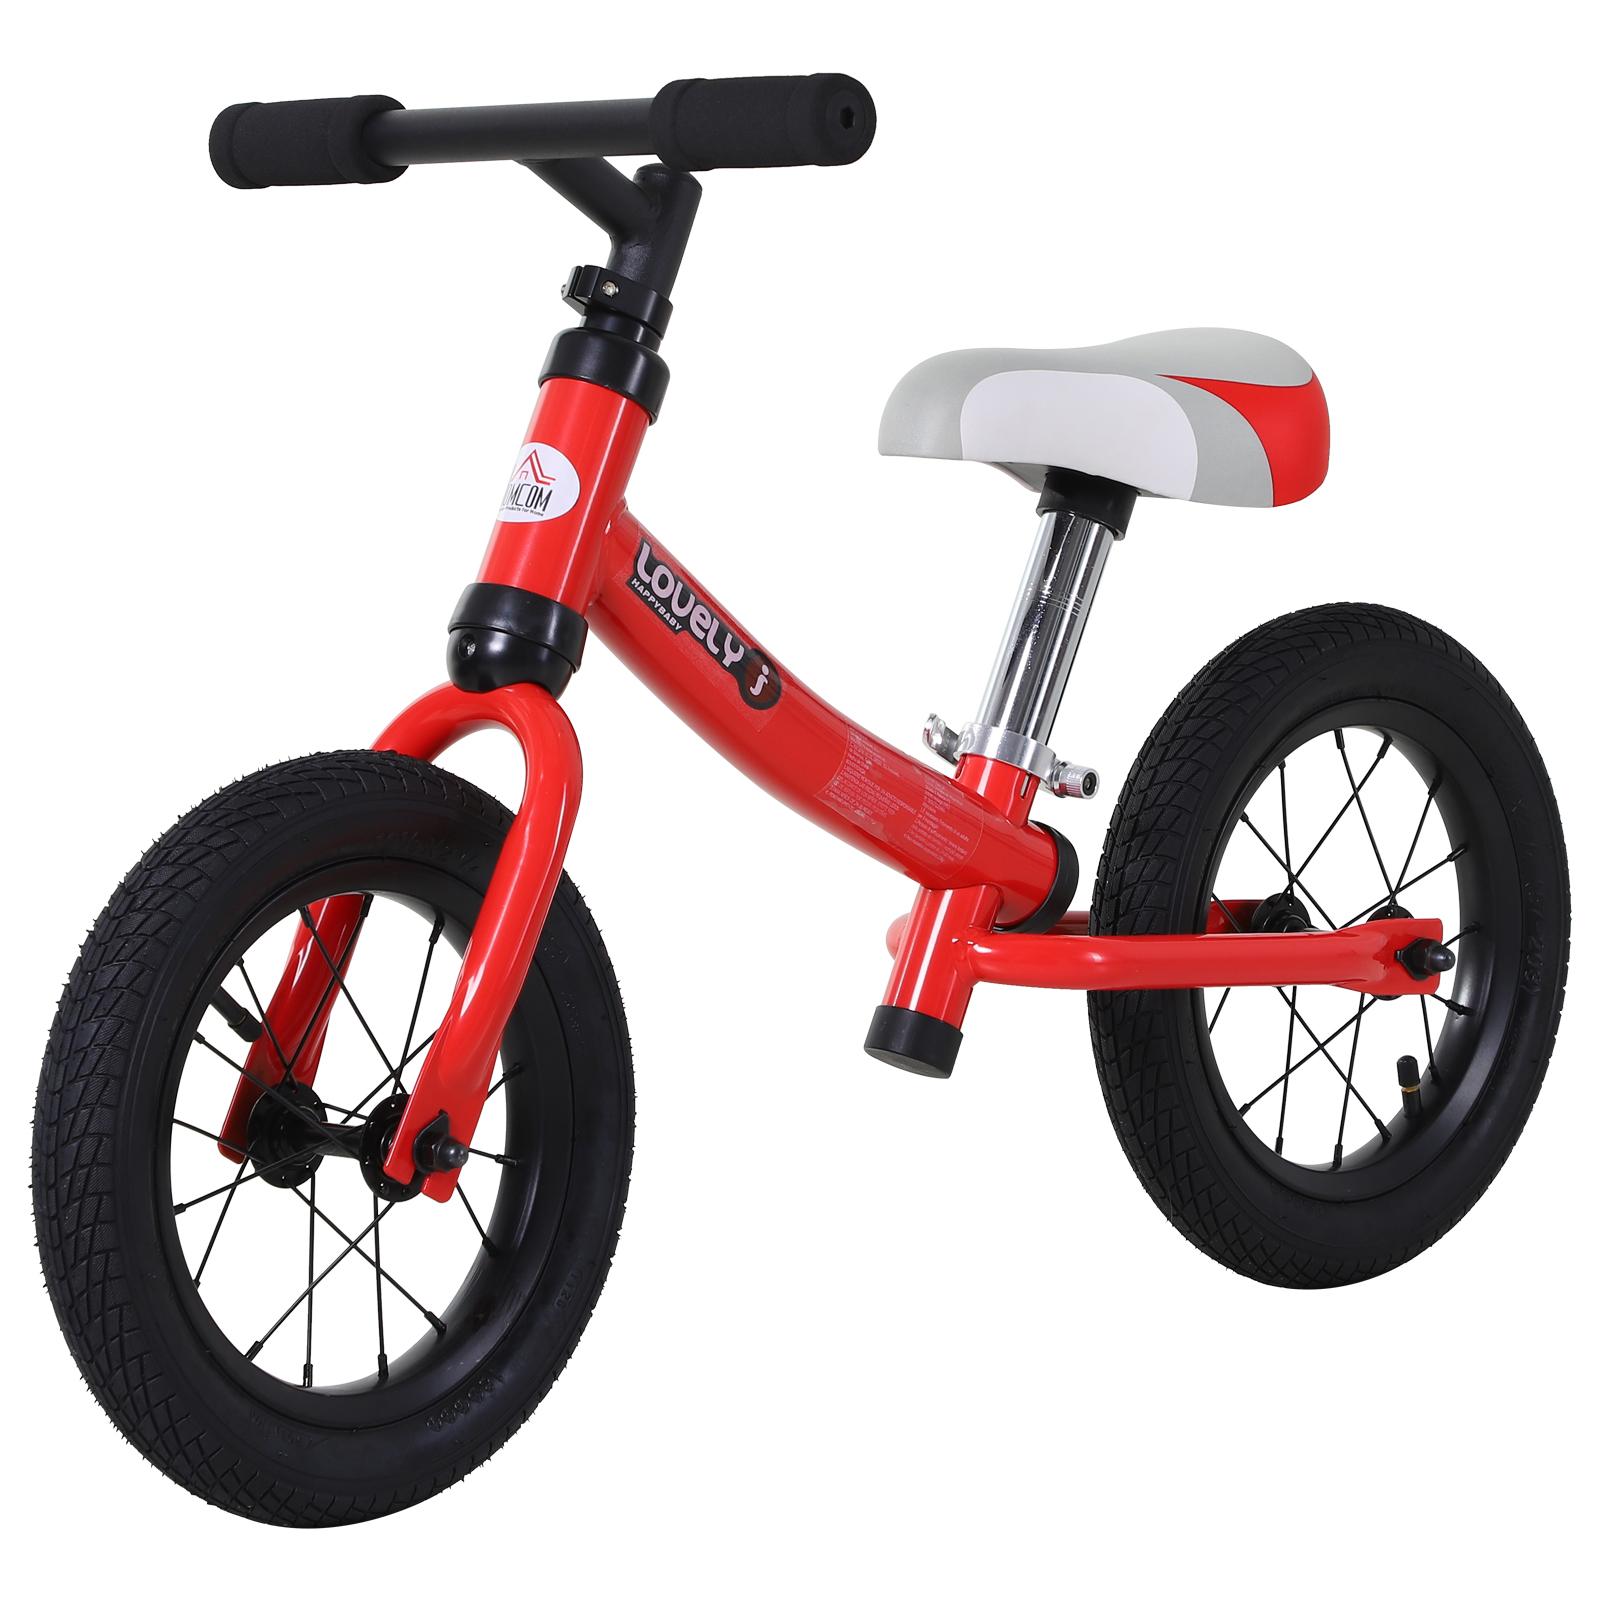 Bicicleta-sin-Pedales-de-Altura-de-Asiento-Regulable-31-45cm-2-5-Anos miniatura 15